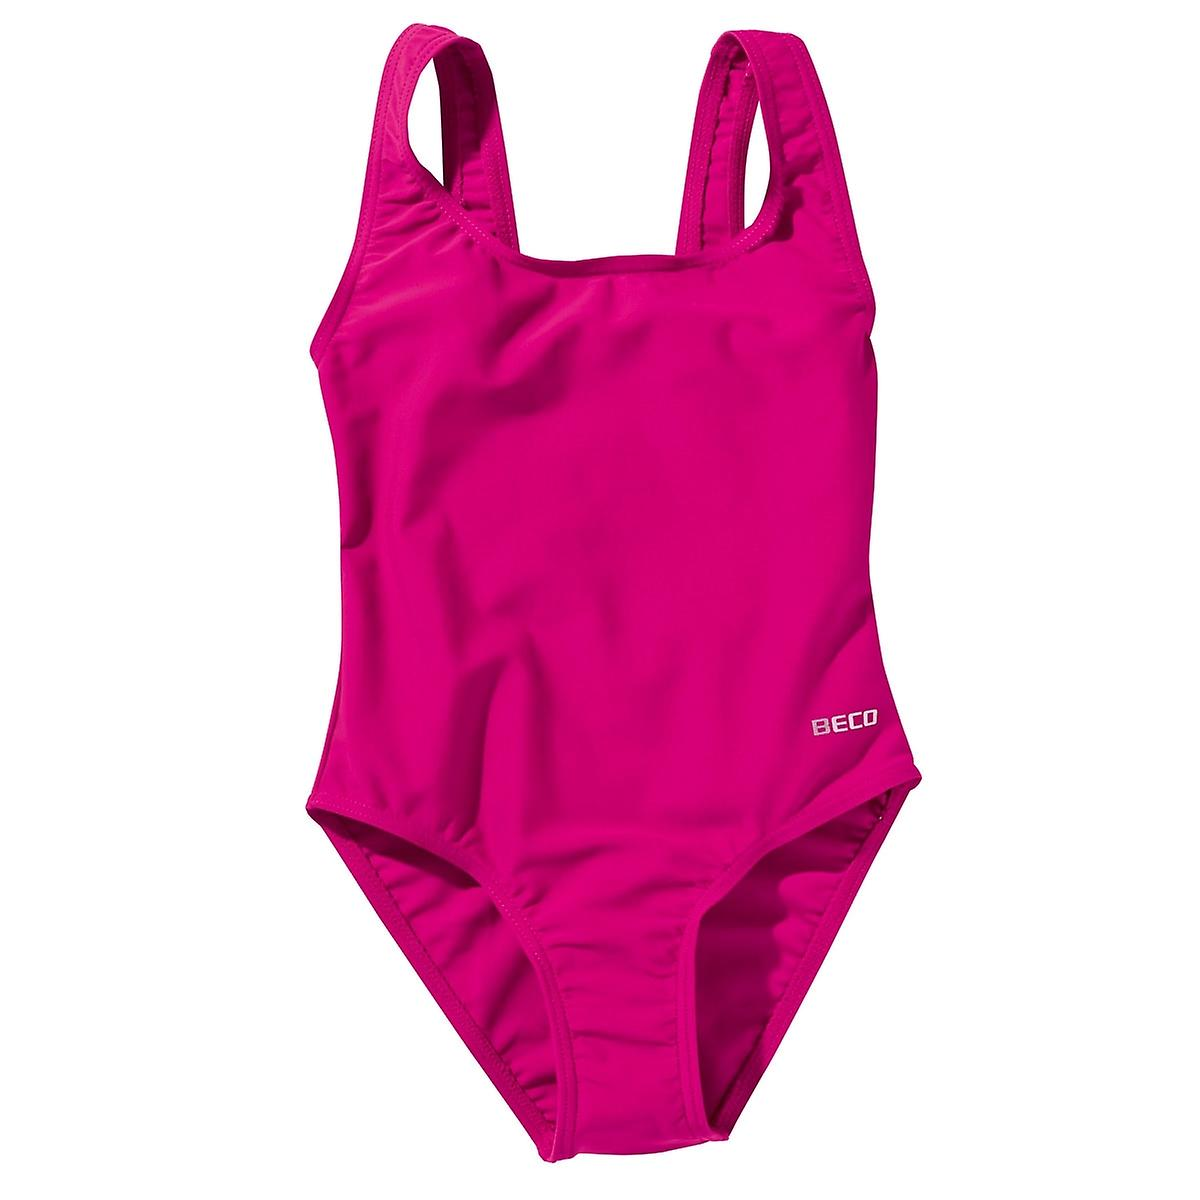 BECO Mädchen Surfer Mädchen Badeanzug - Pink